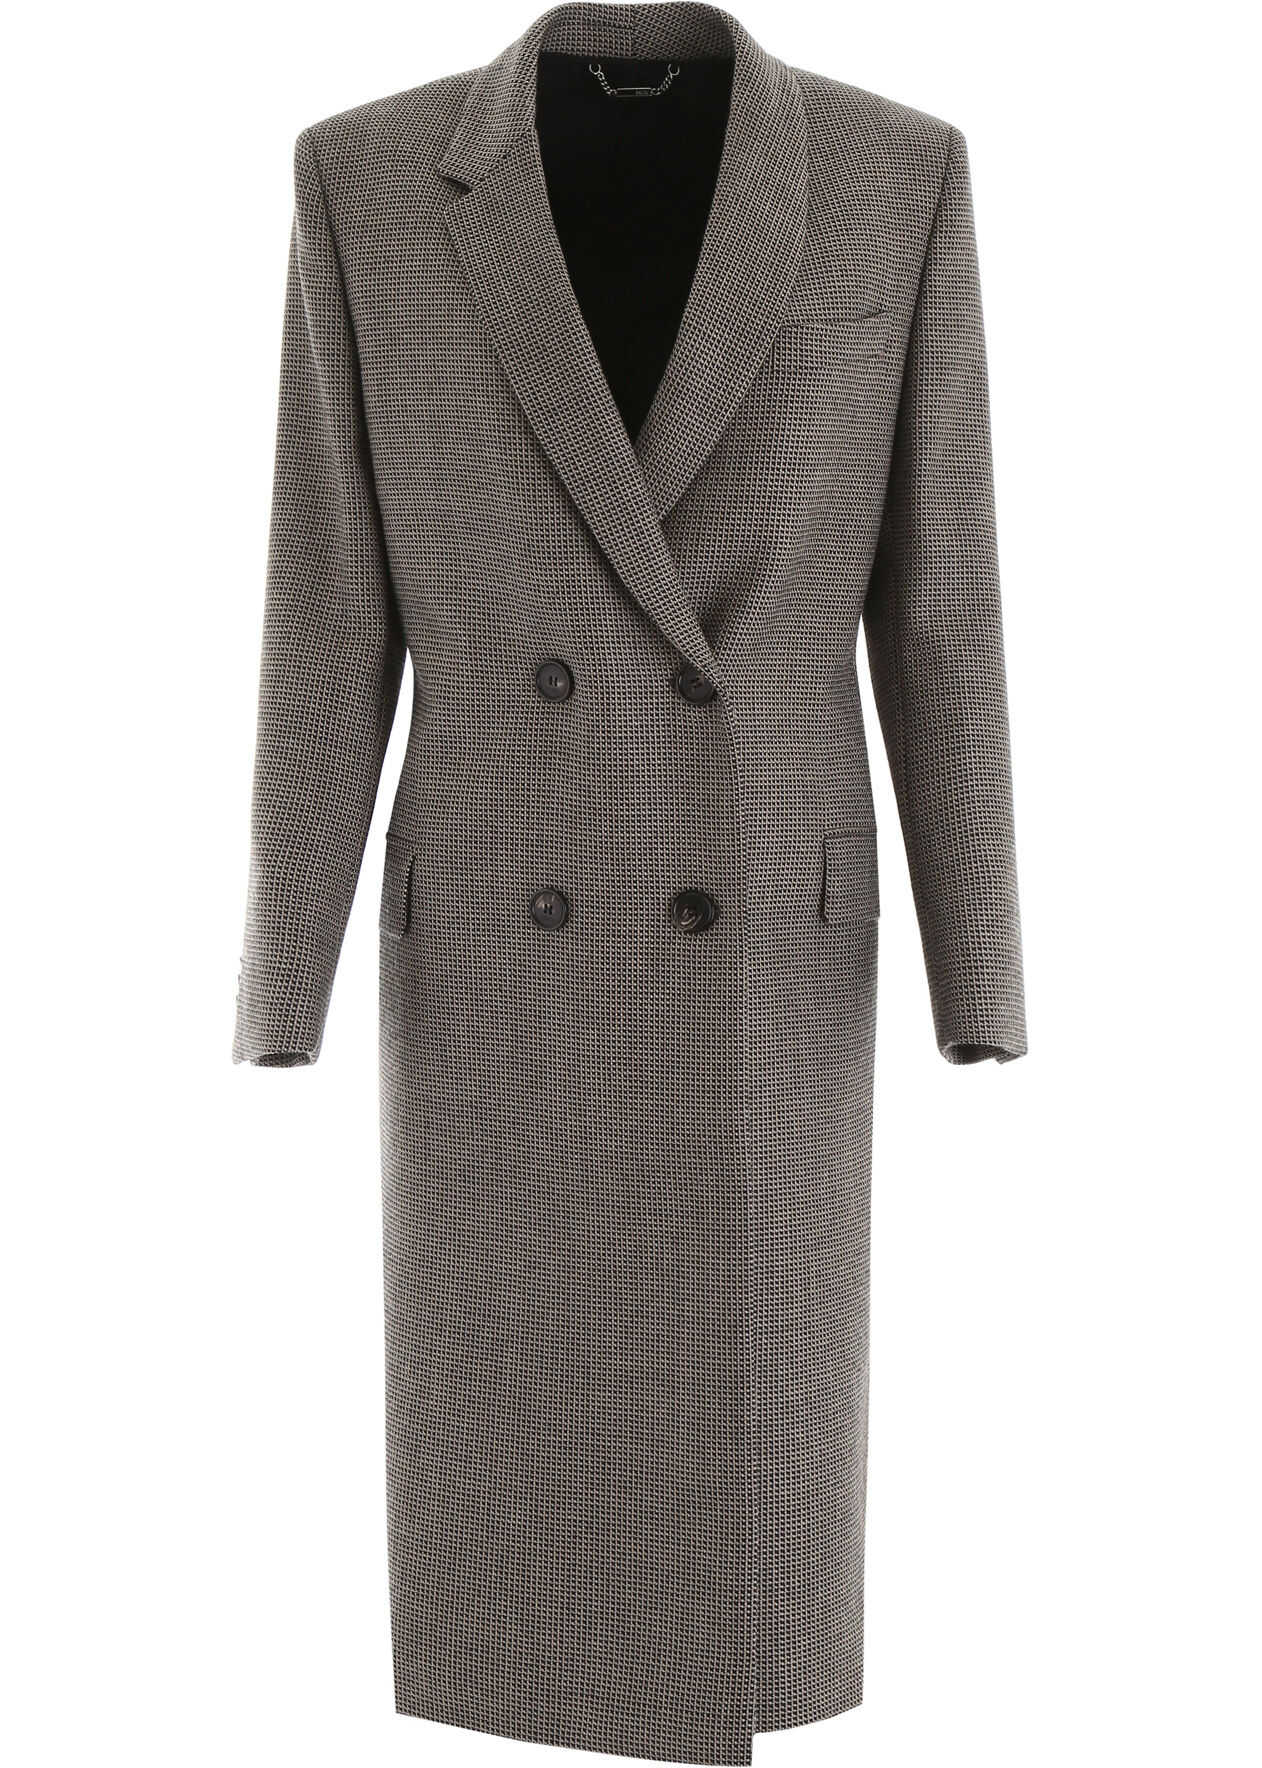 Fendi Long Coat With Scarf Belt BROWN BEIGE